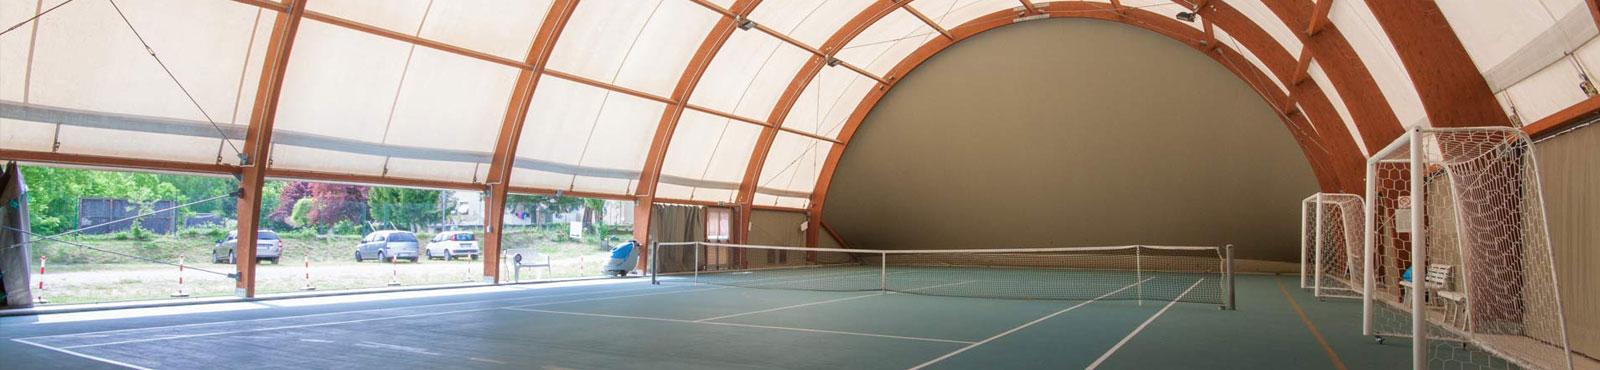 Tennis3small